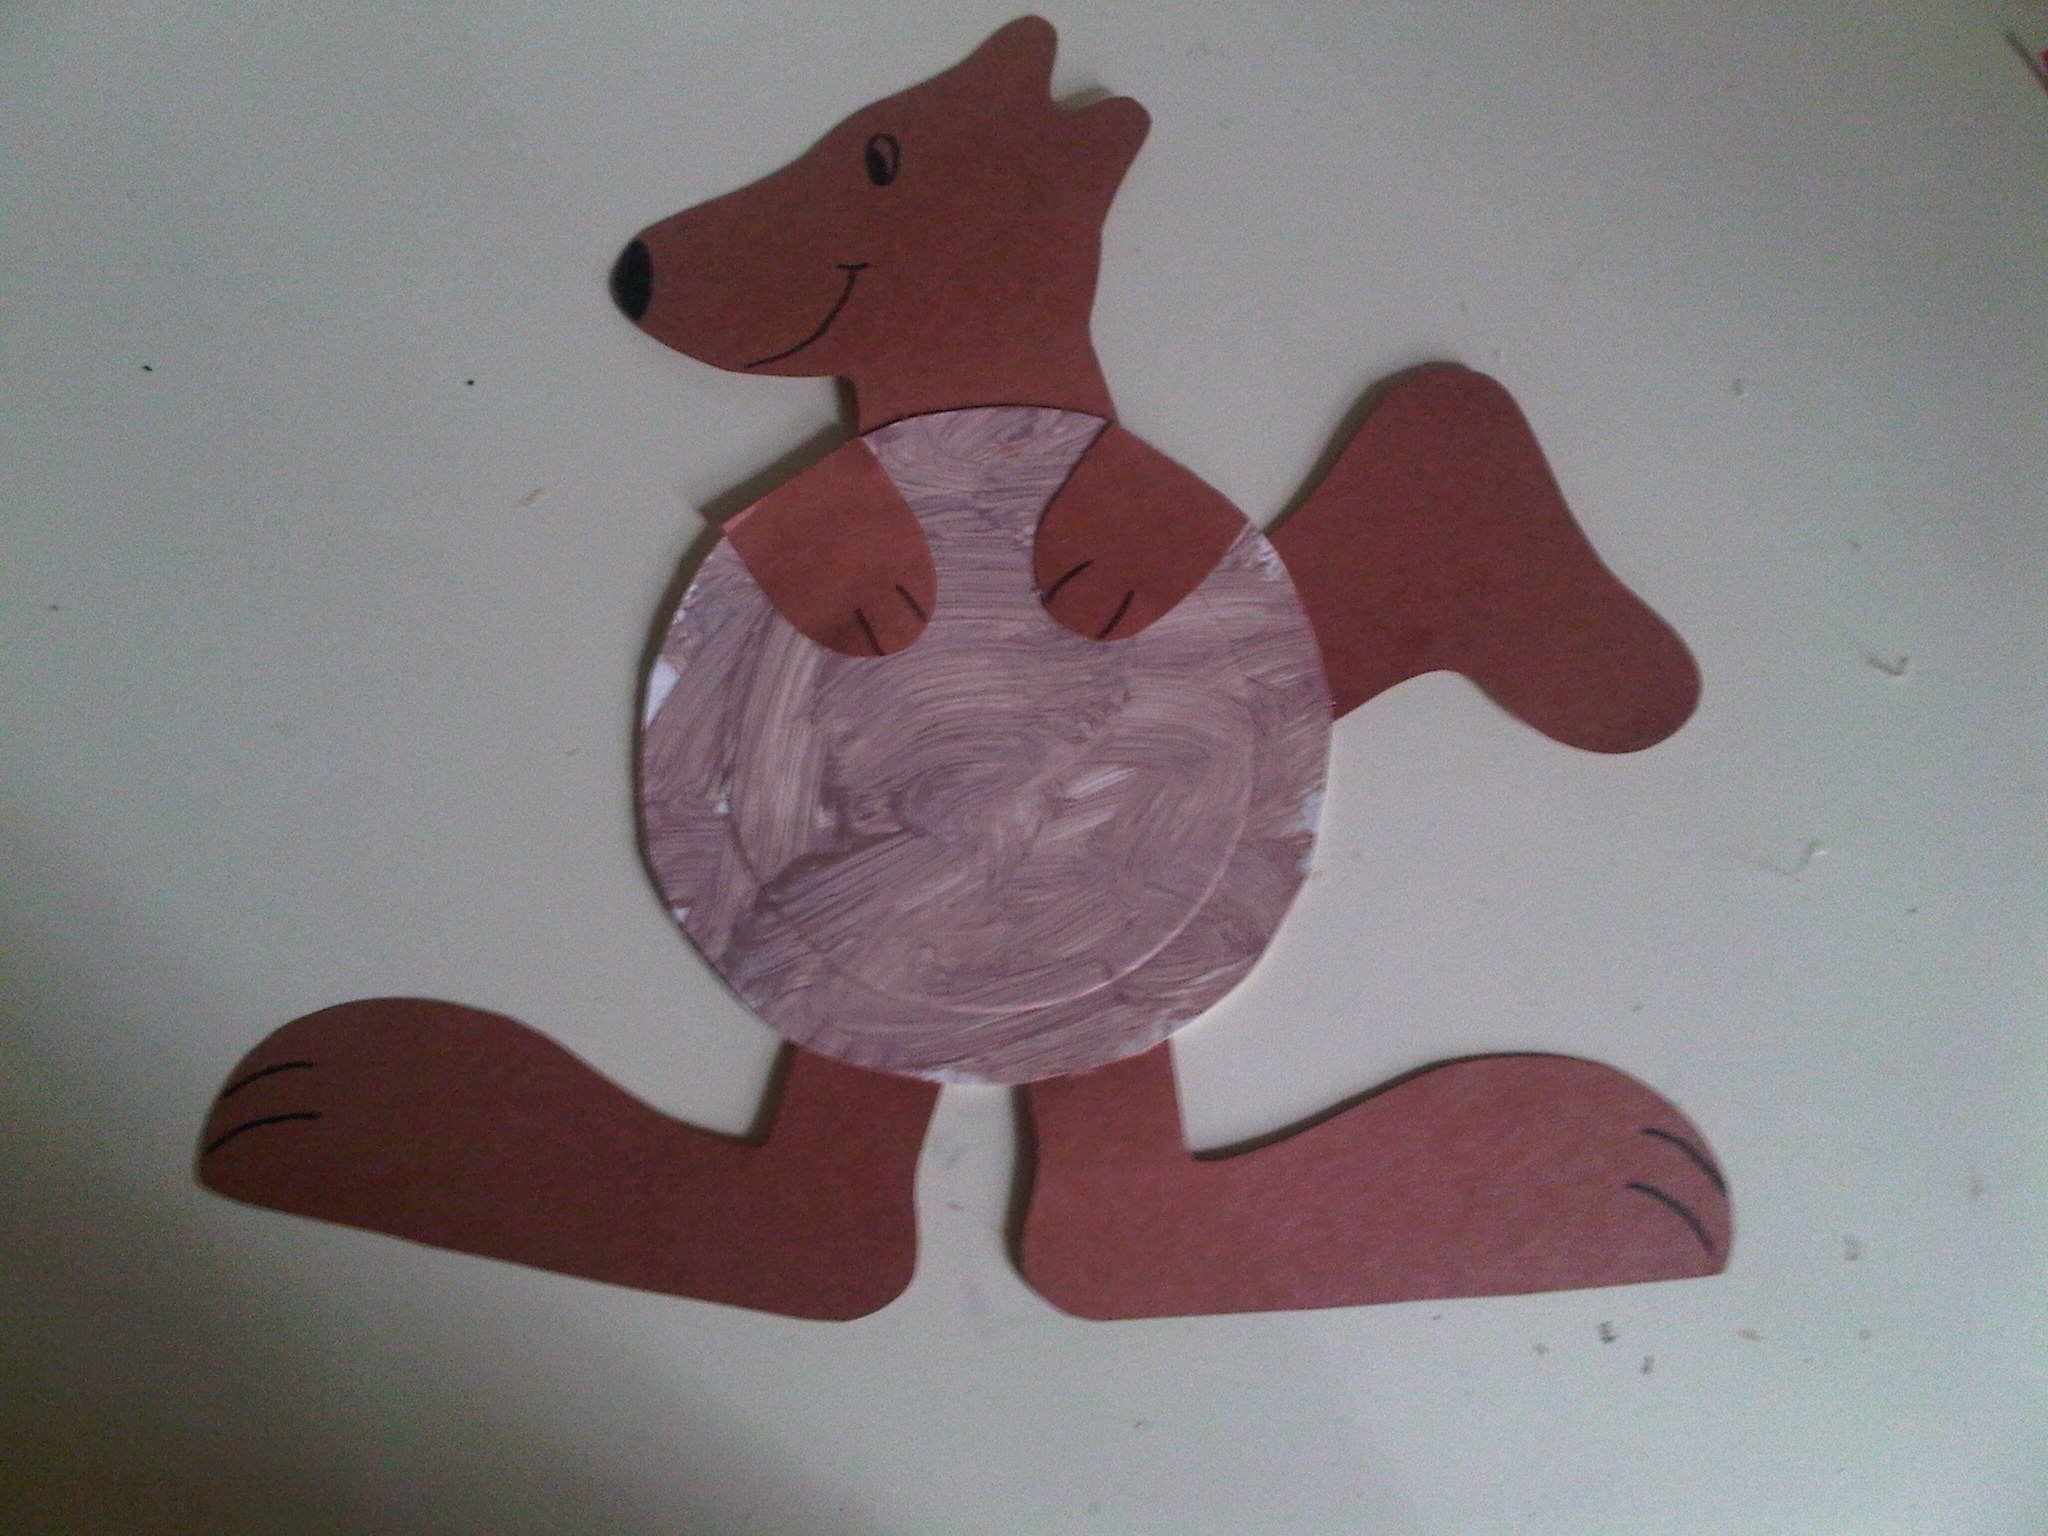 Ellie S Art Project Paper Plate Kangaroo